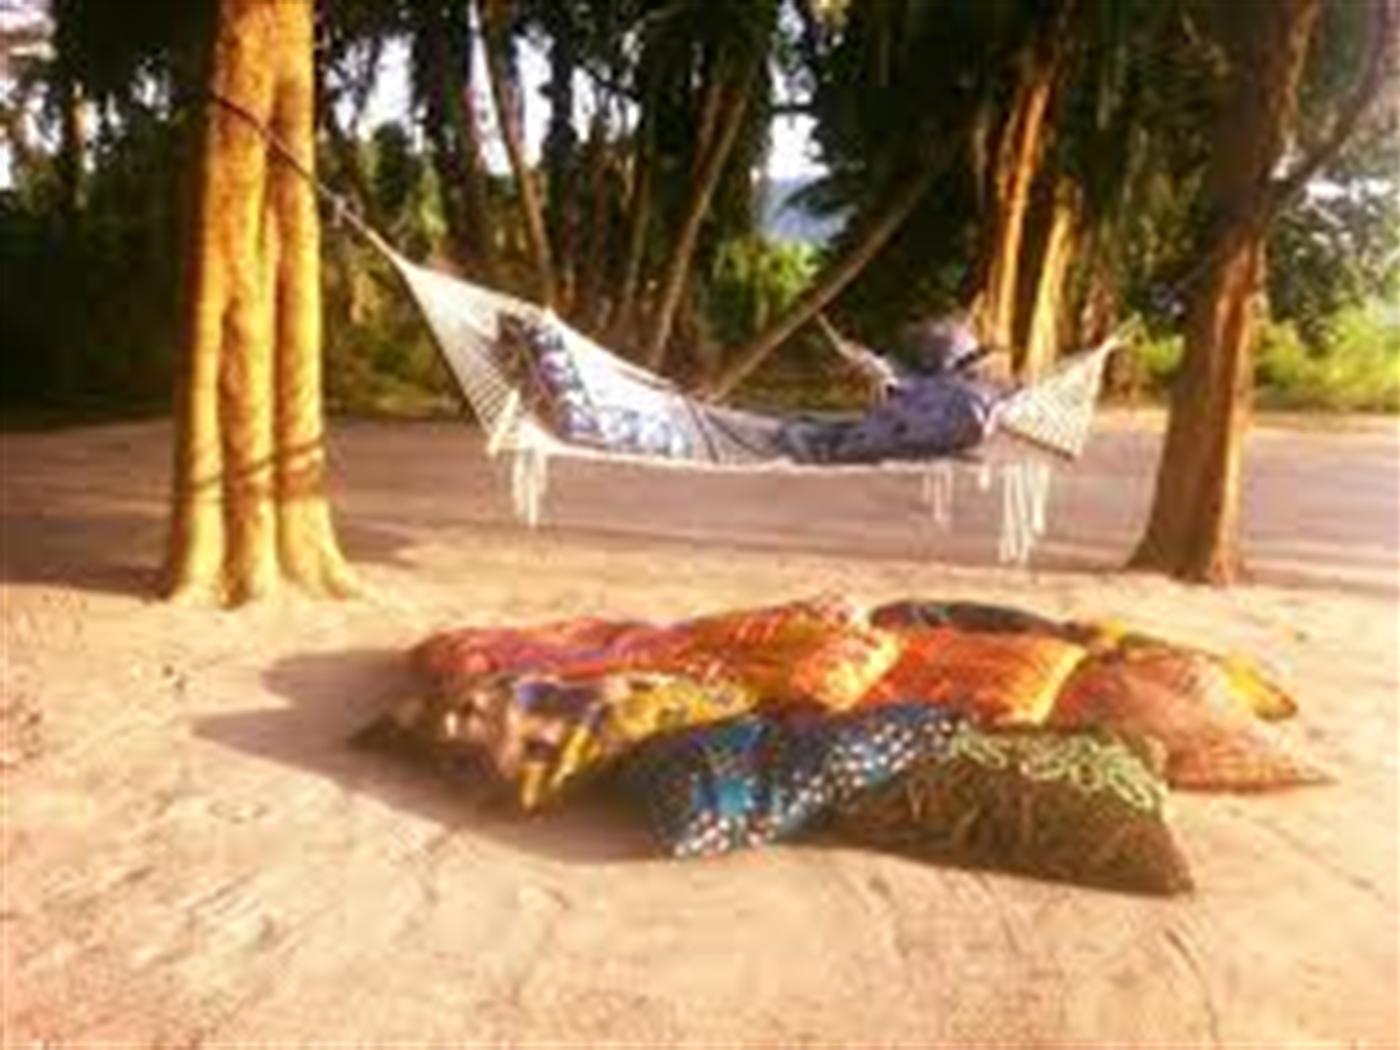 Beach for sale in Nkokonjeru Mukono